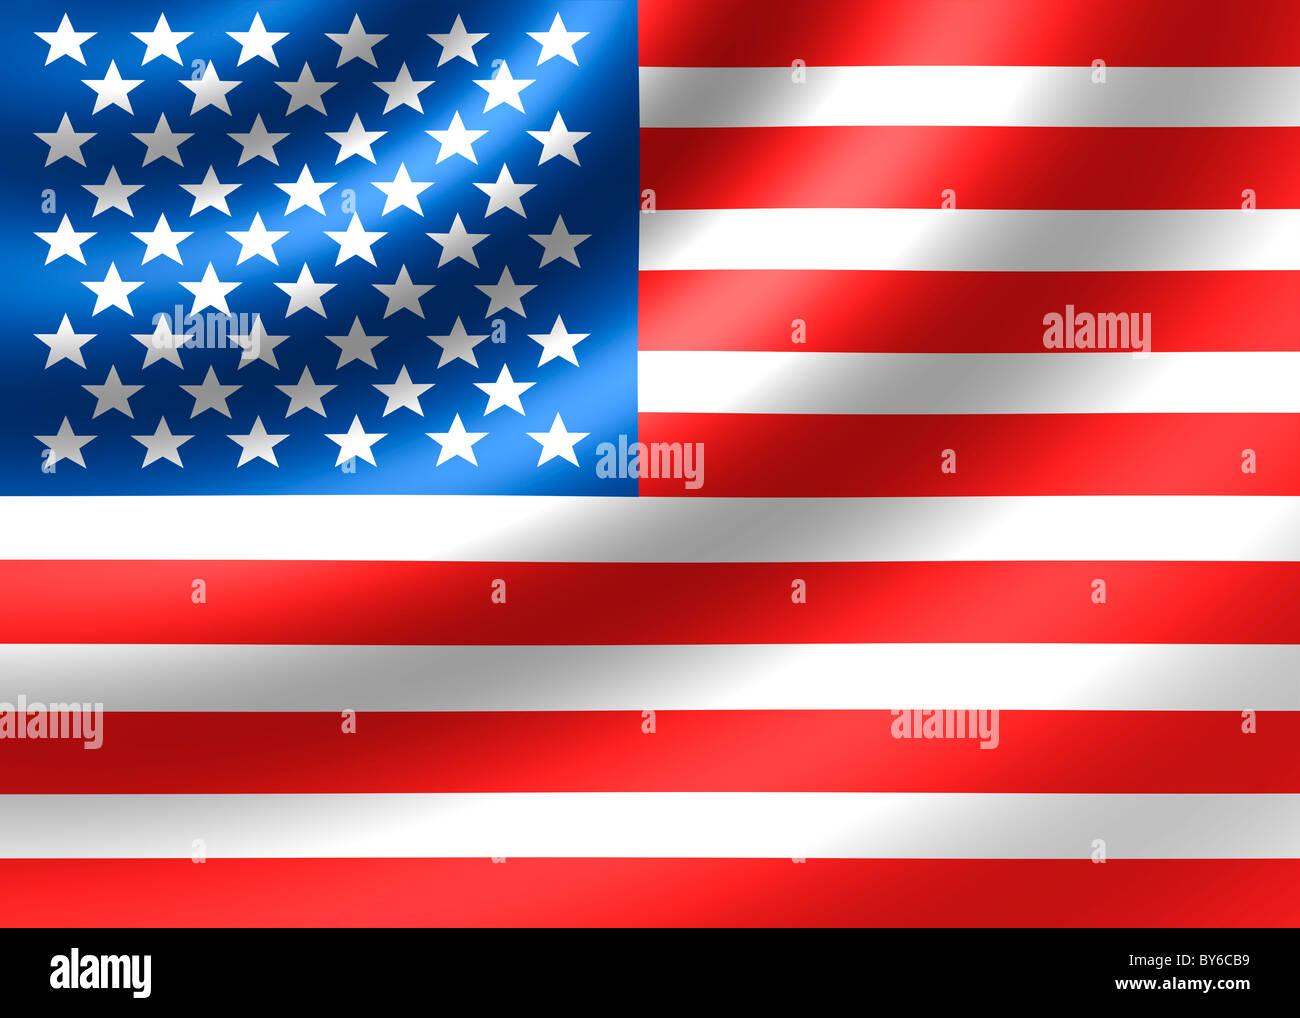 United States of America USA US flag - Stock Image